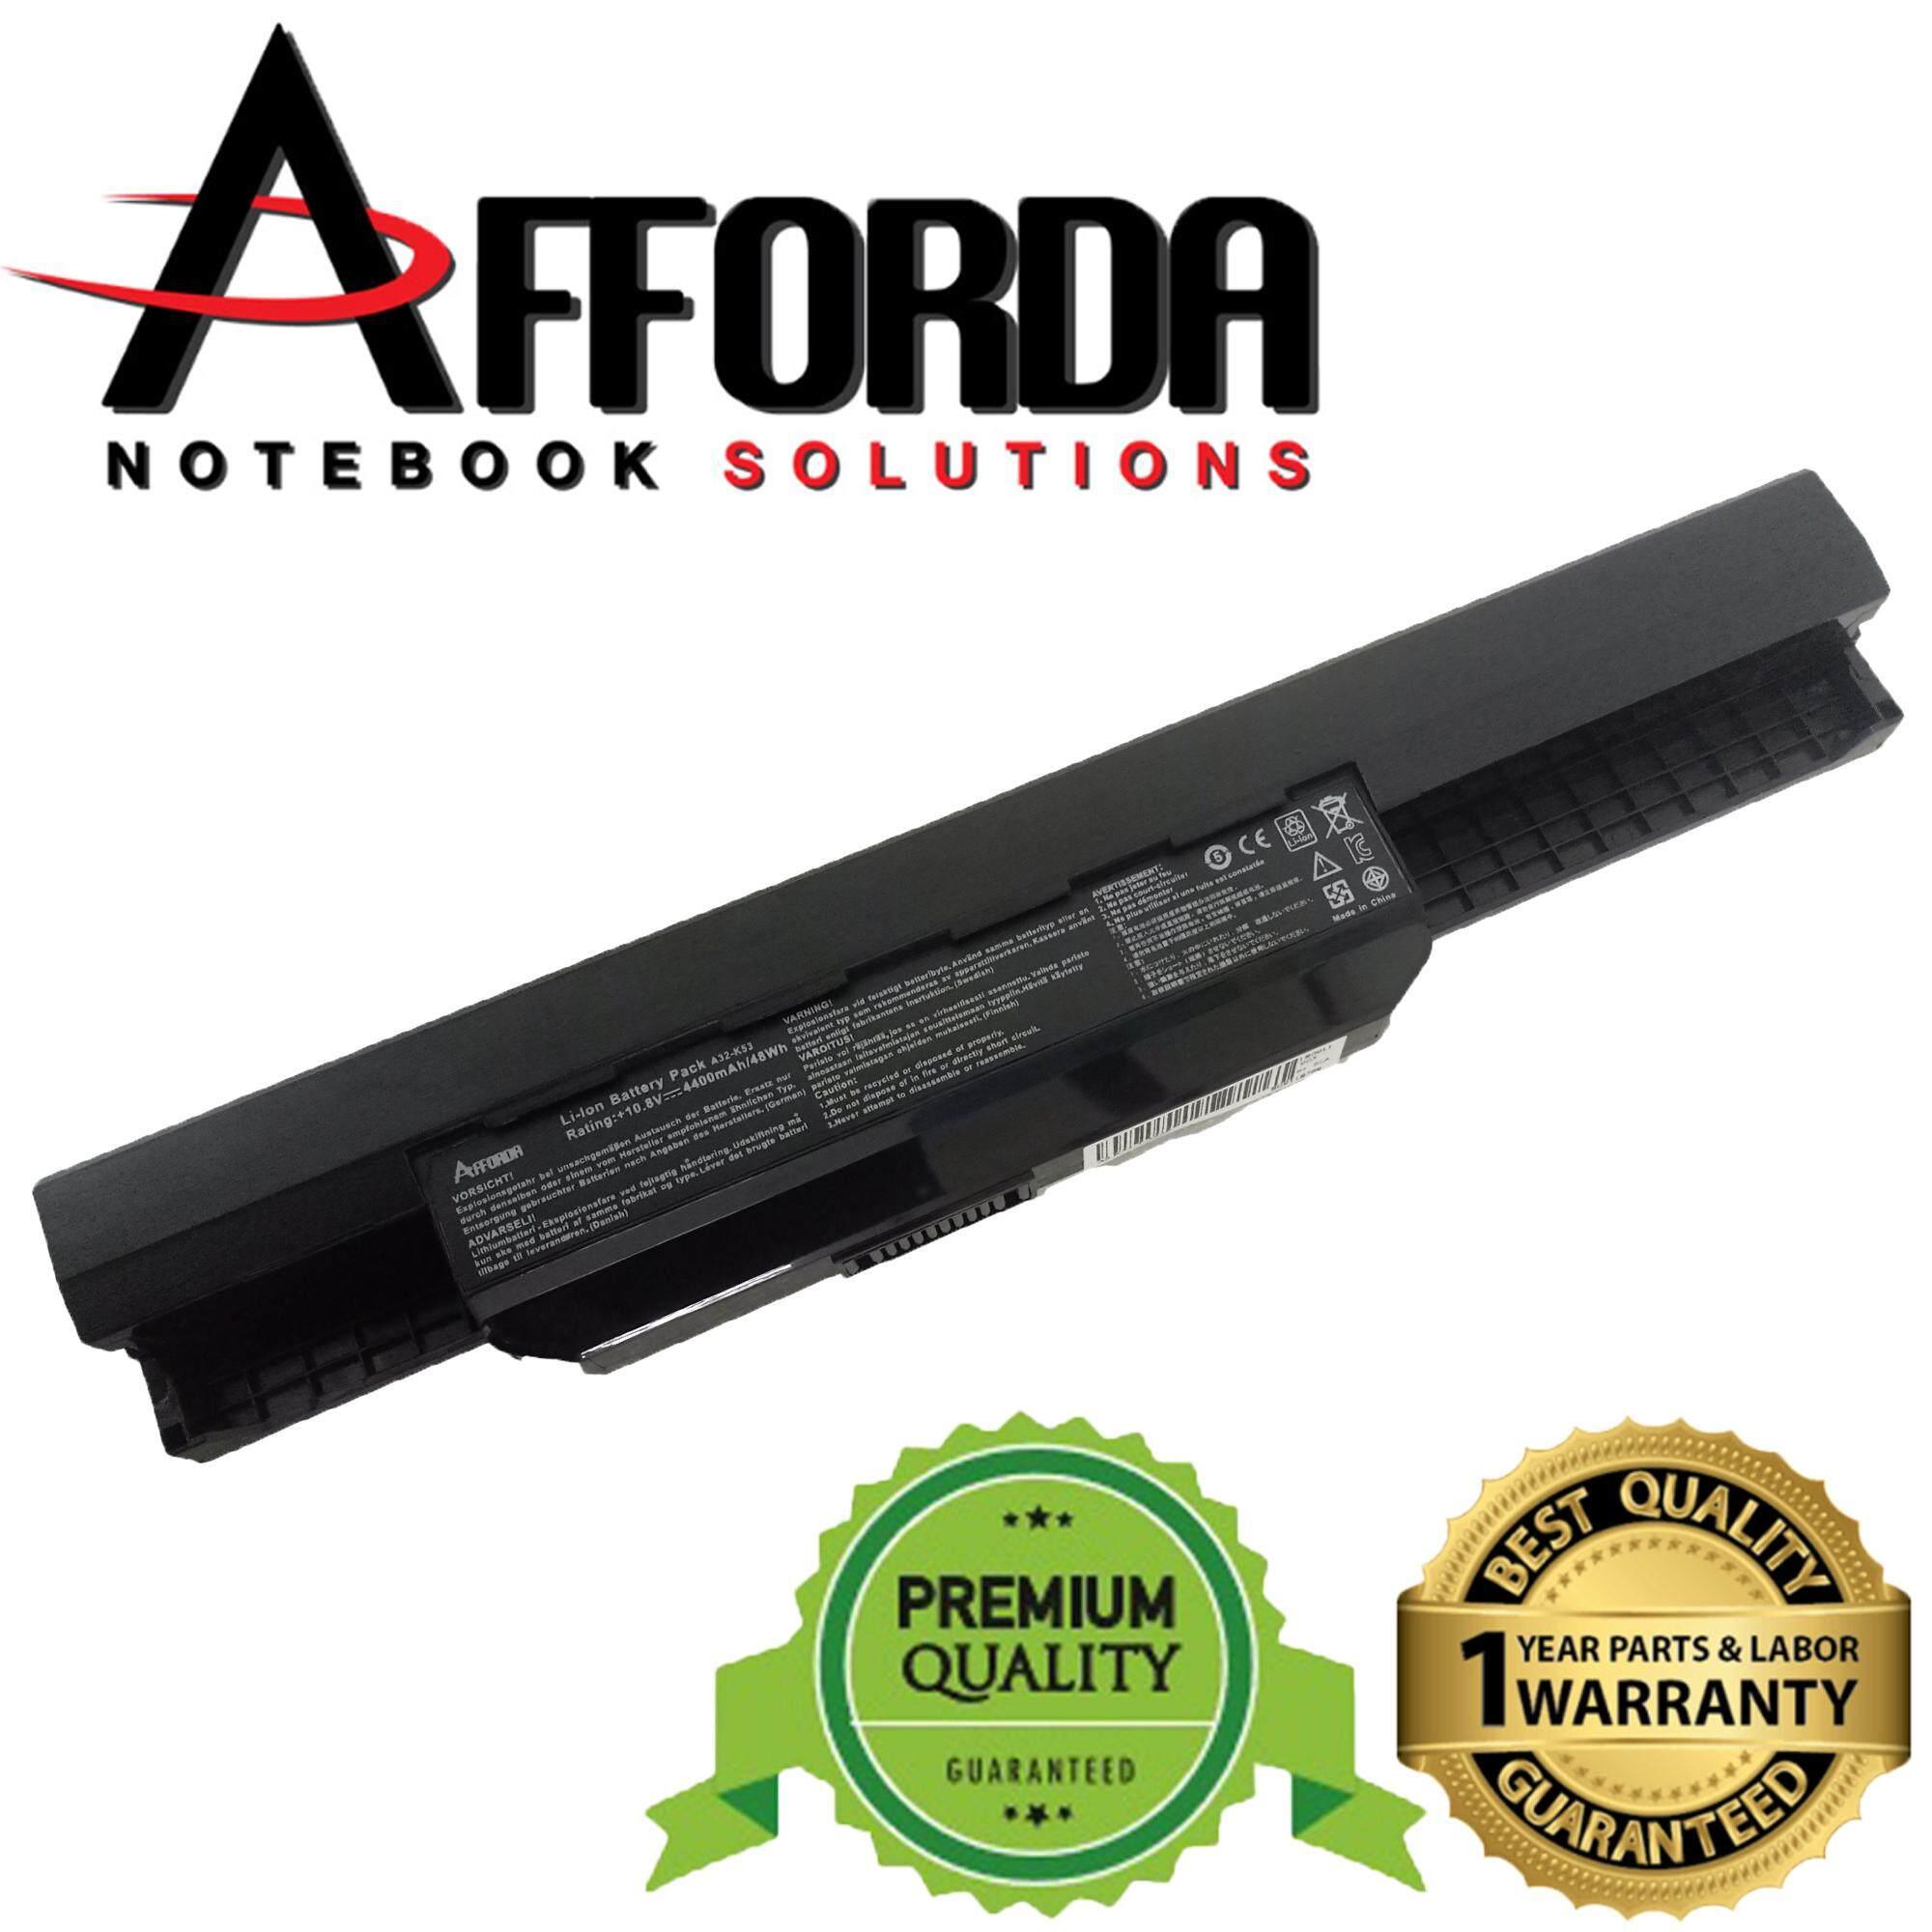 Asus K53 Notebook Laptop Battery